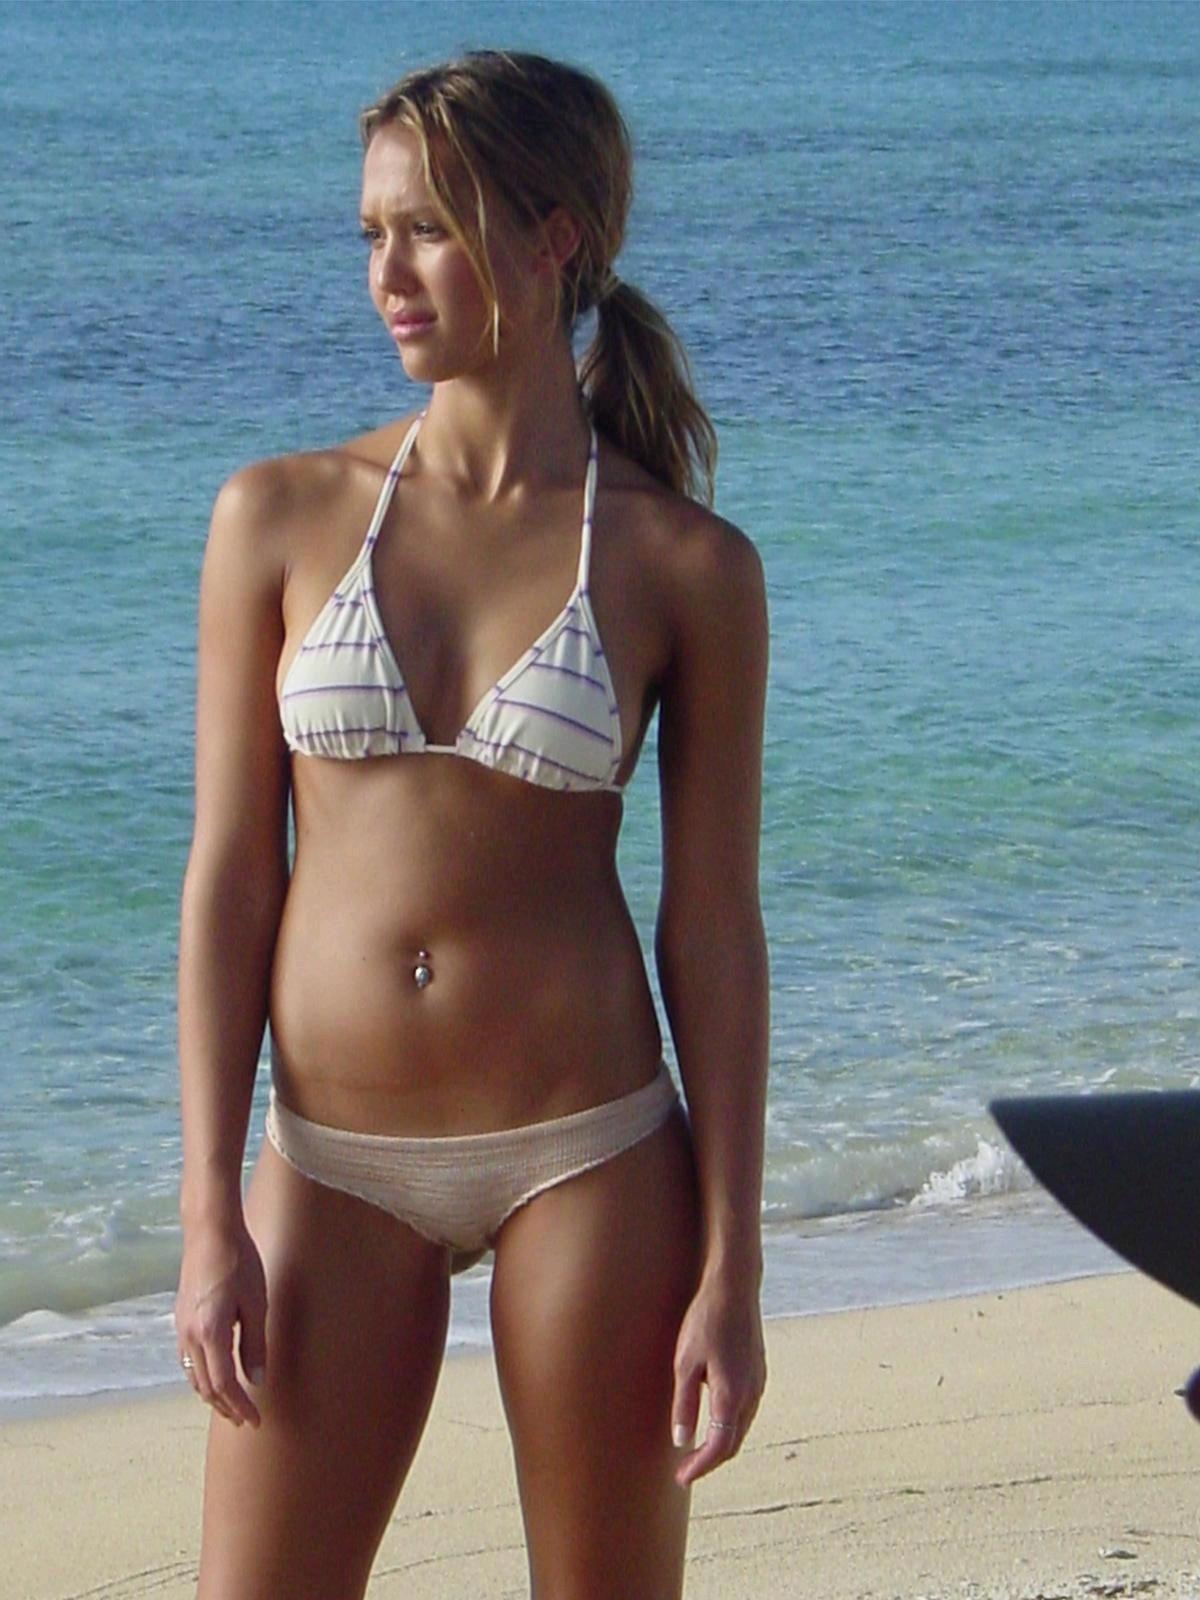 Skinny Models? Don't Blame Me